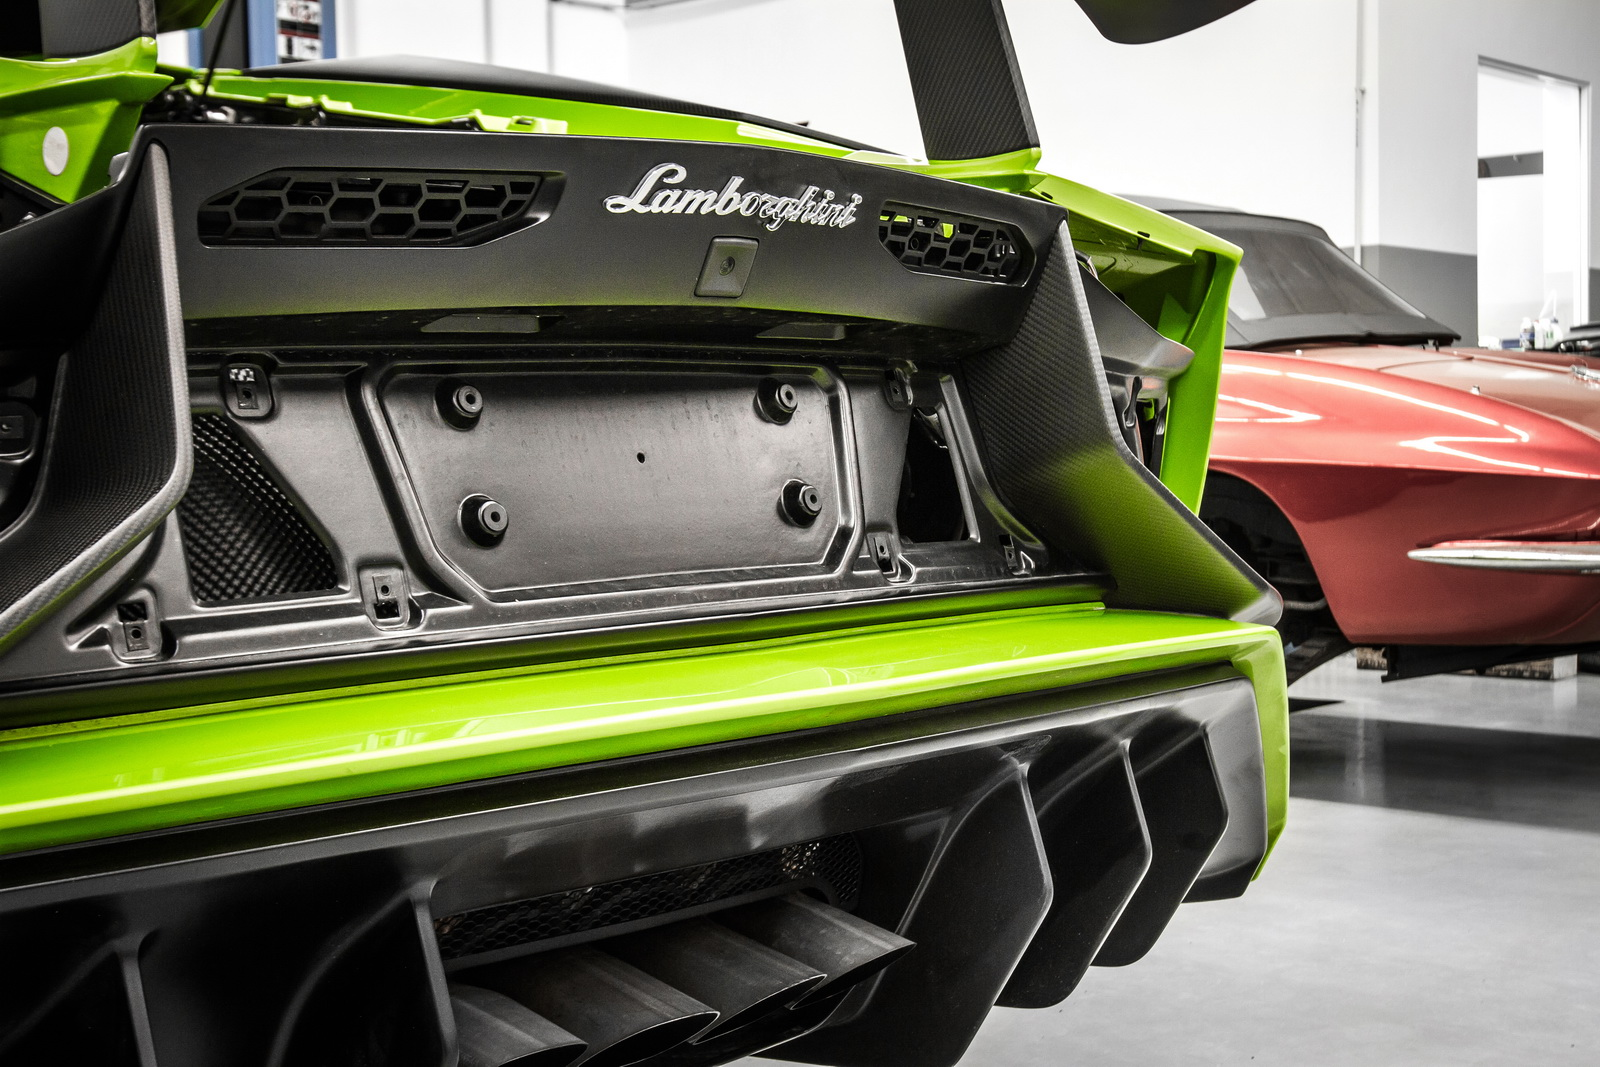 Lamborghini_Aventador_SV_by_Mcchip-DKR_05